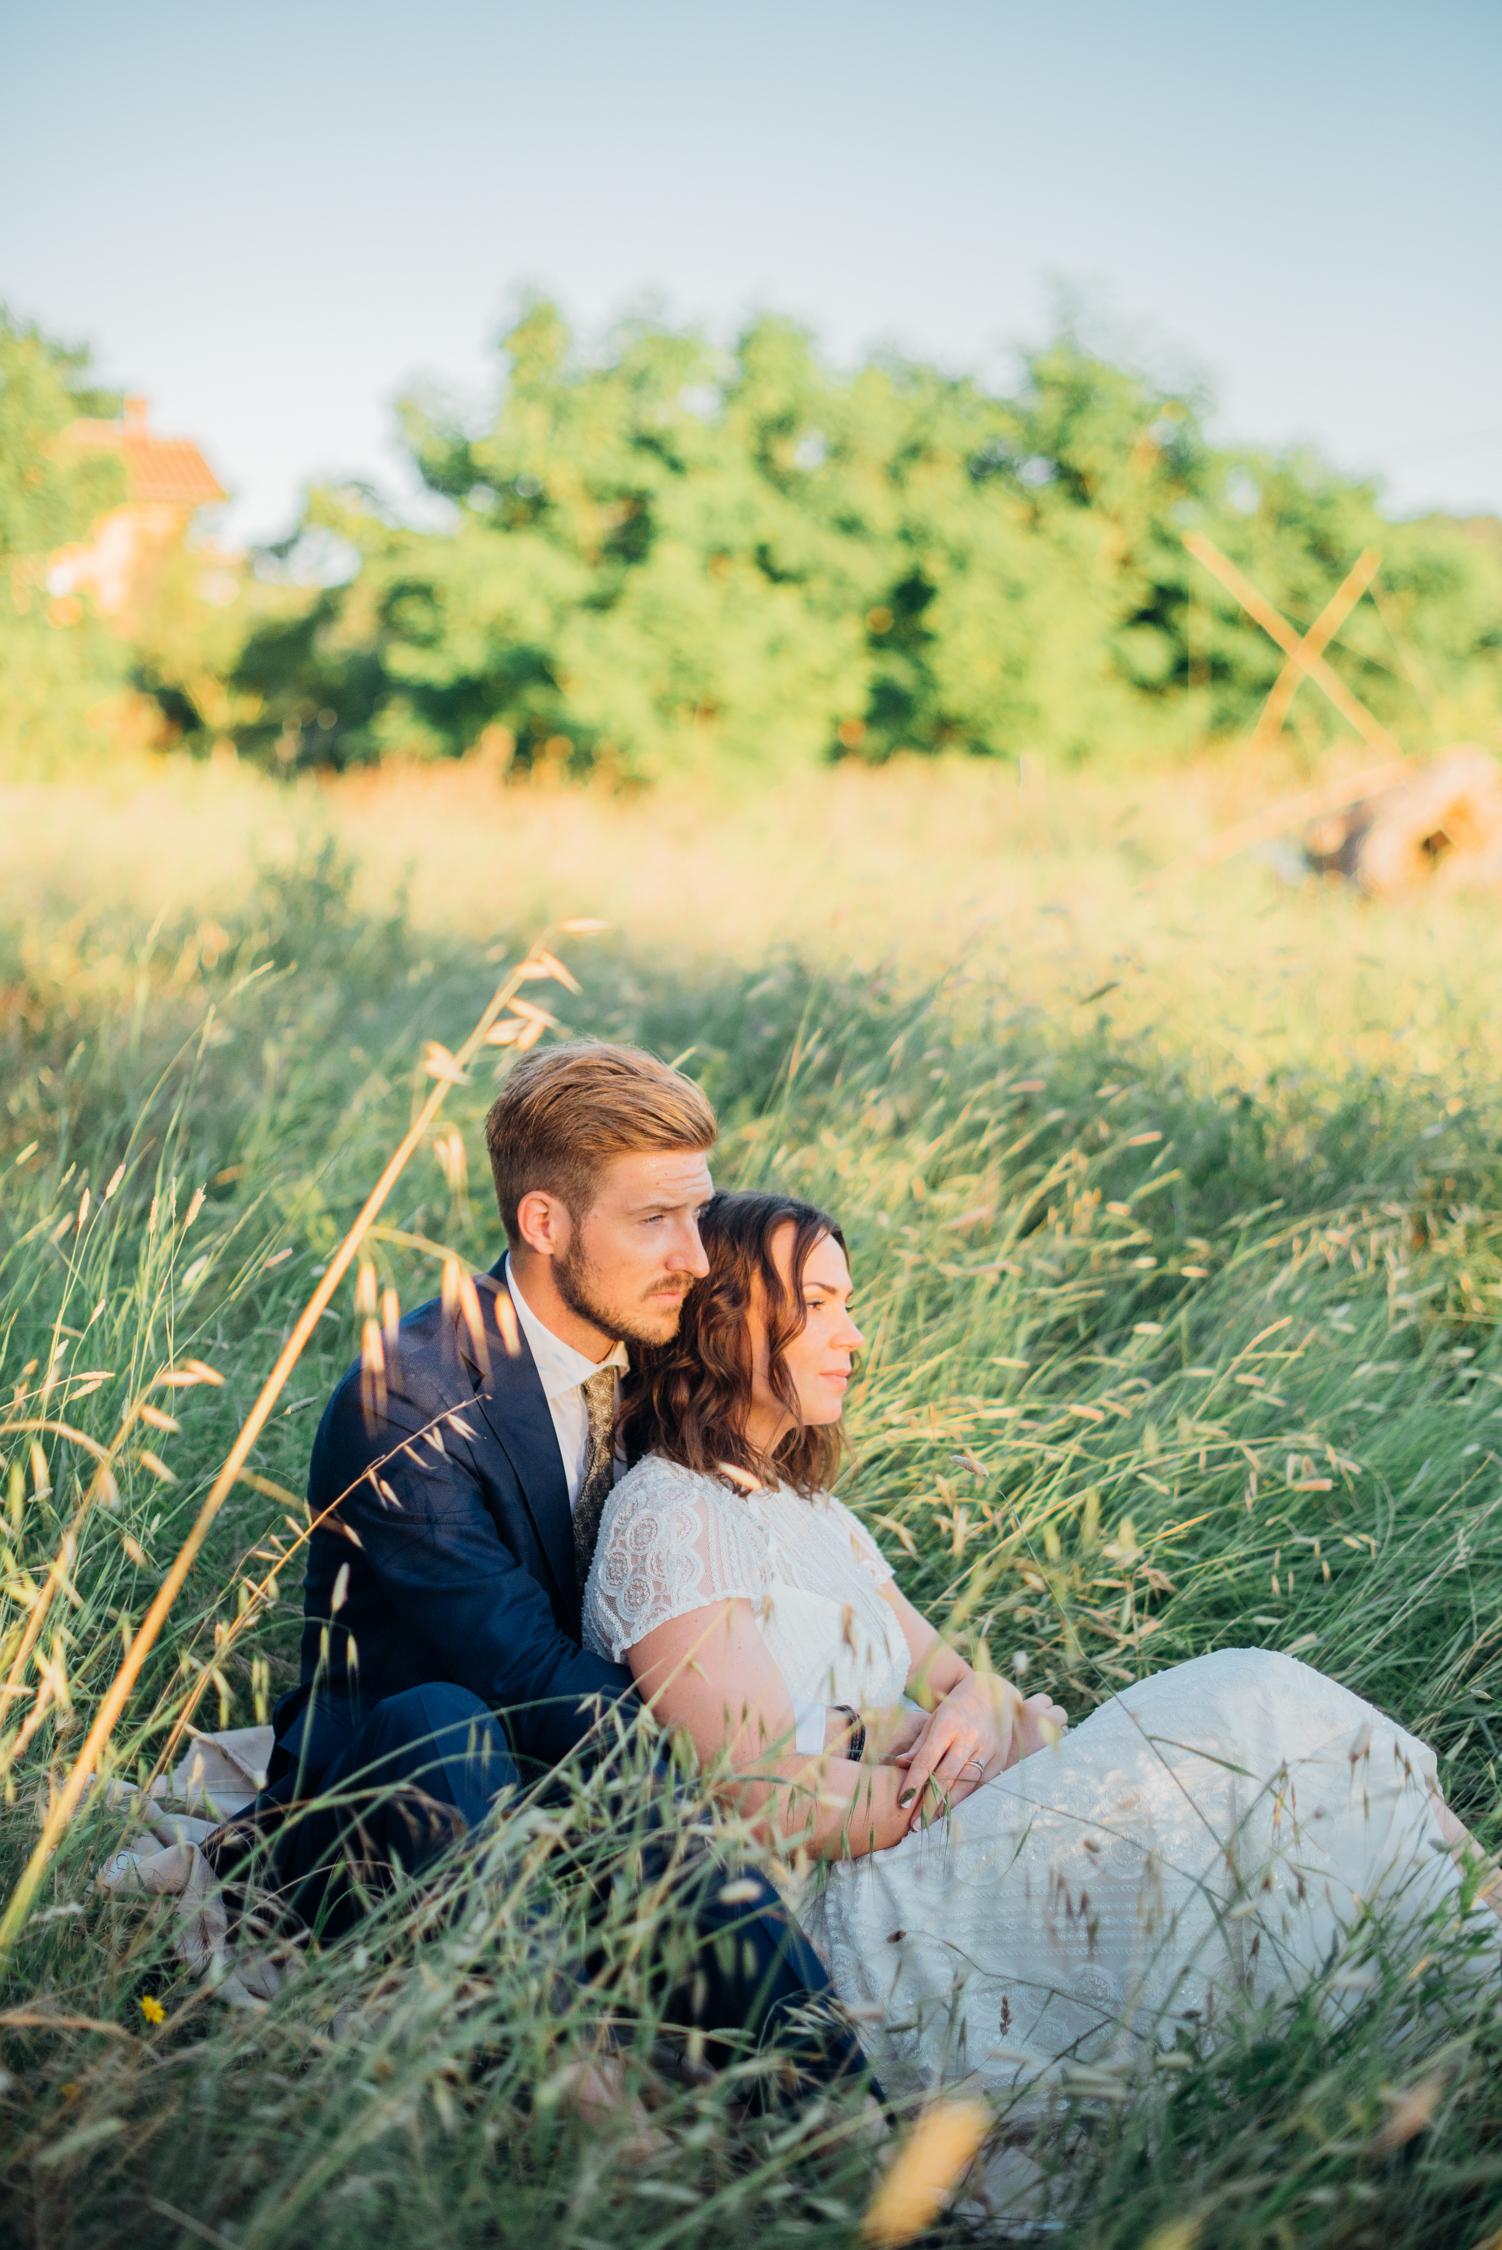 bröllops+blogg+inspiration+lantligt